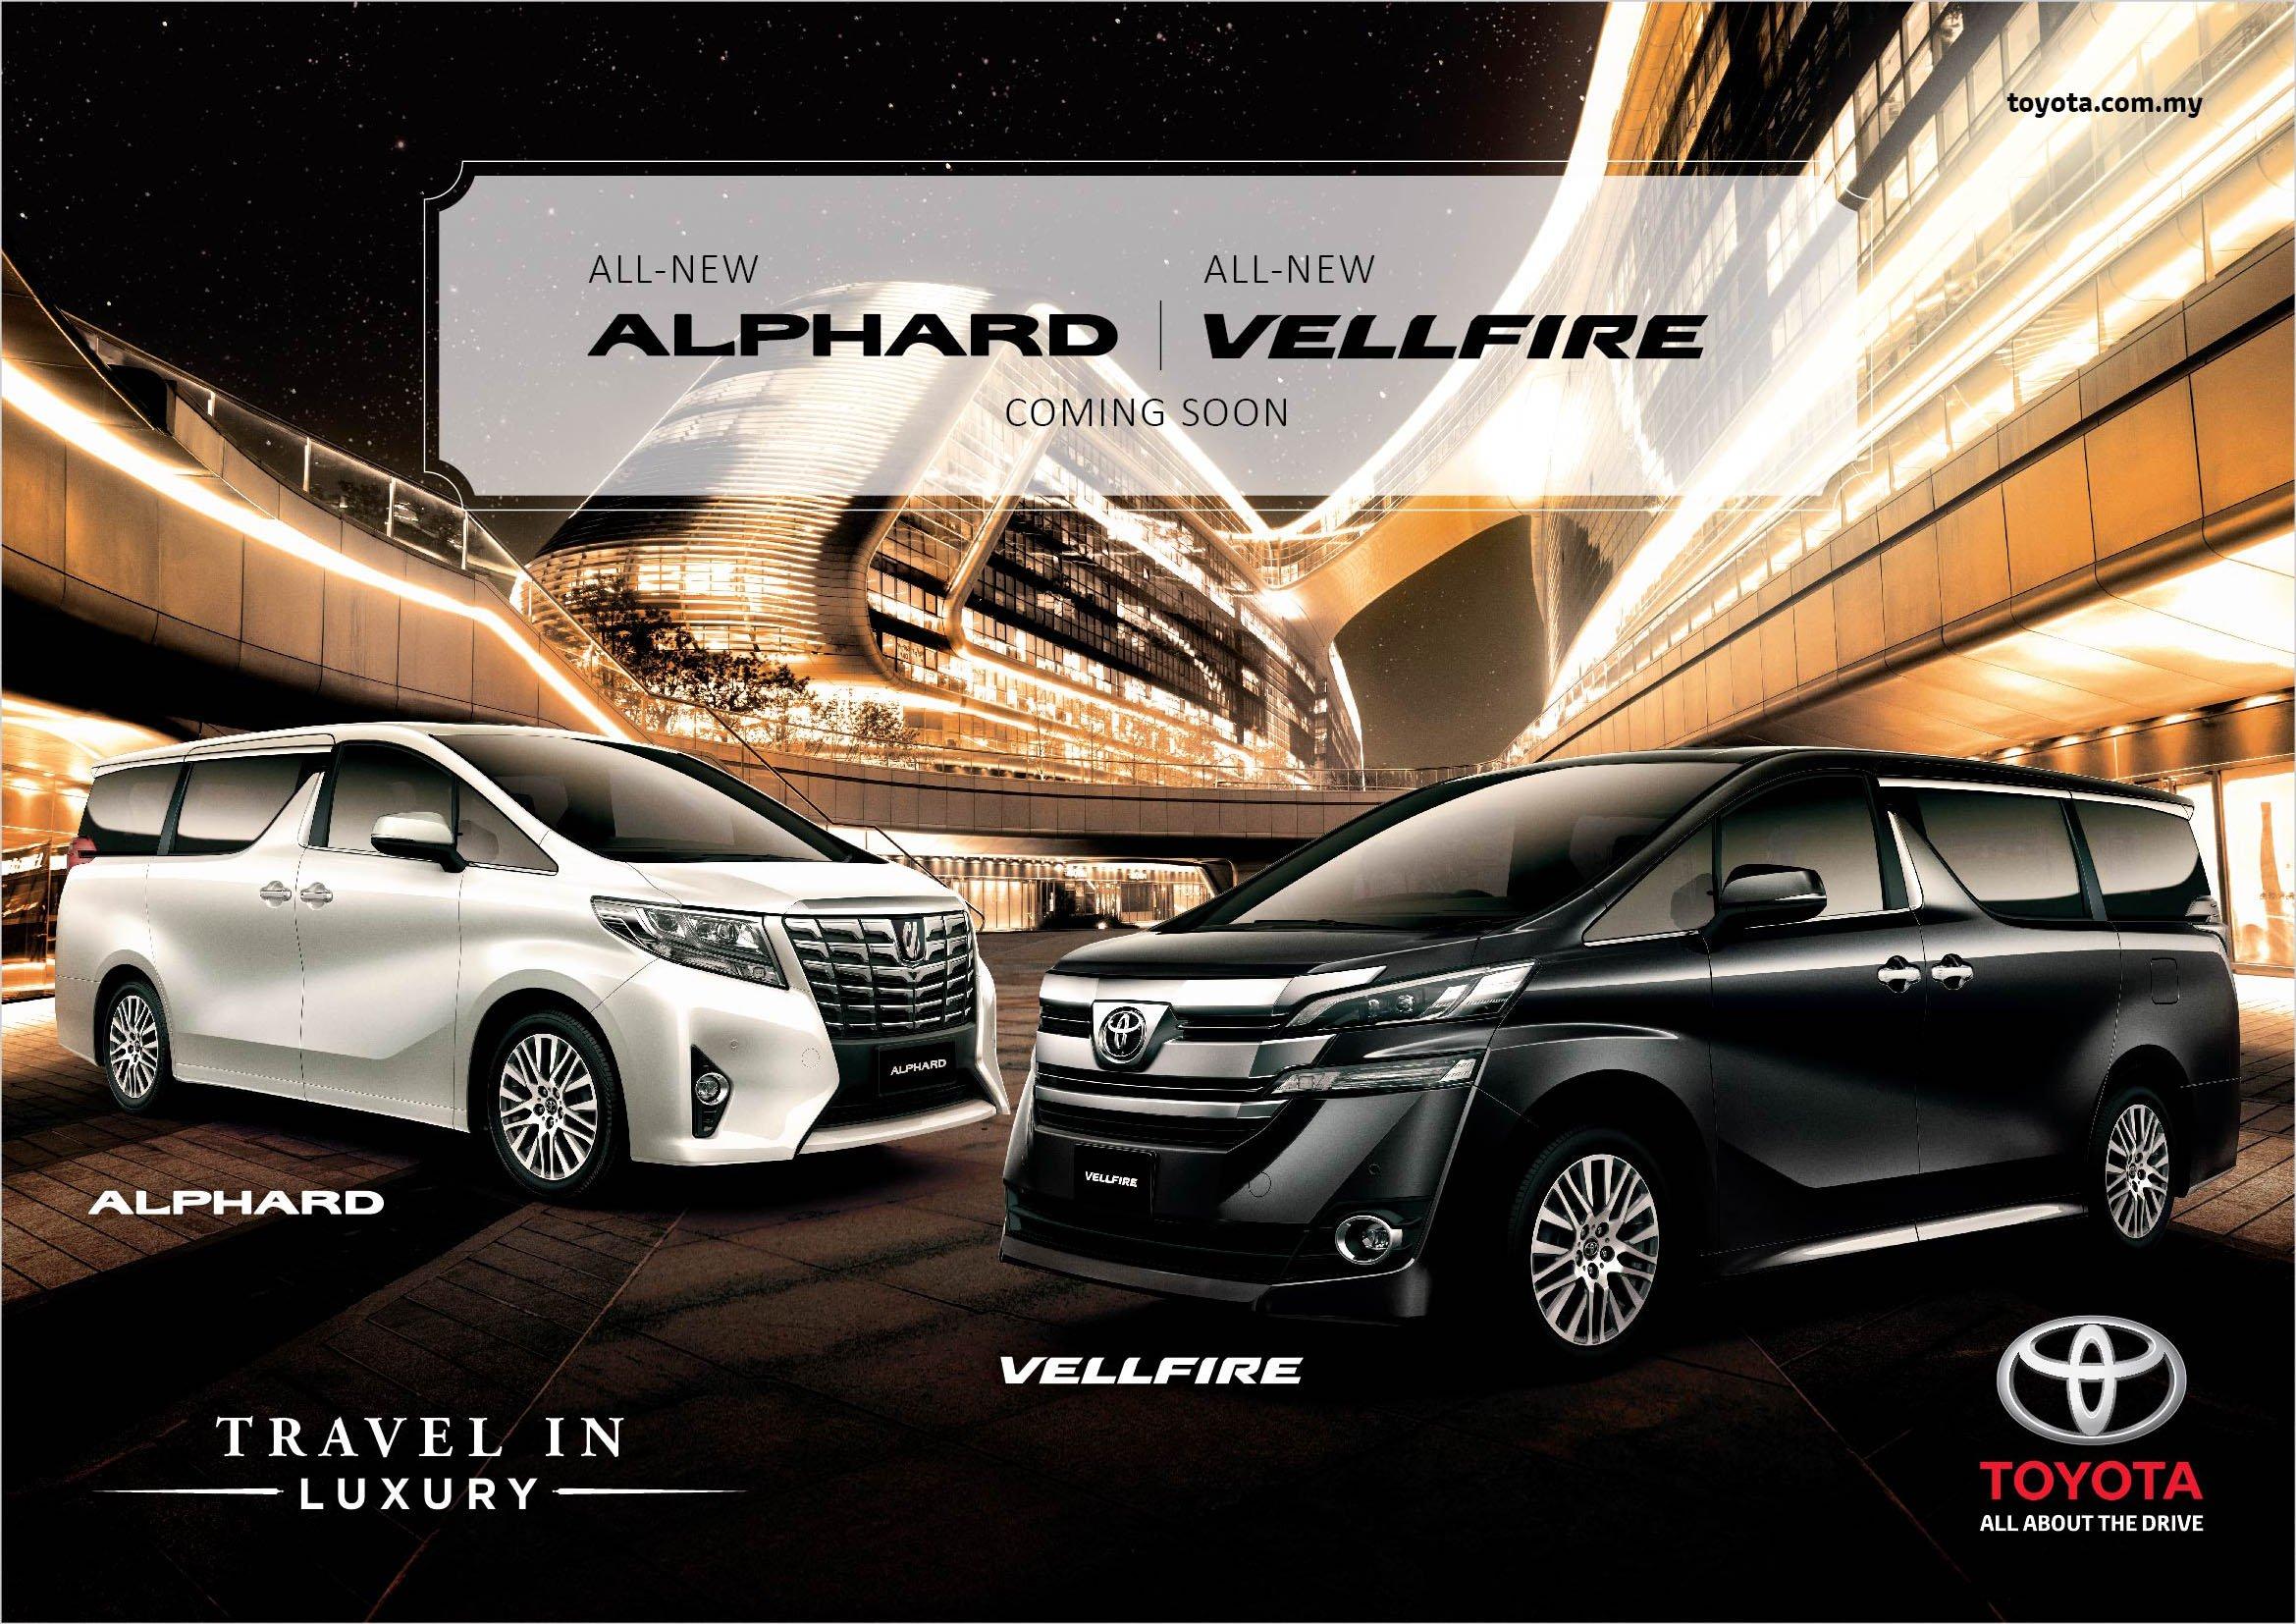 Toyota Vellfire 2.5, Alphard 3.5 dan 3.5 Executive Lounge